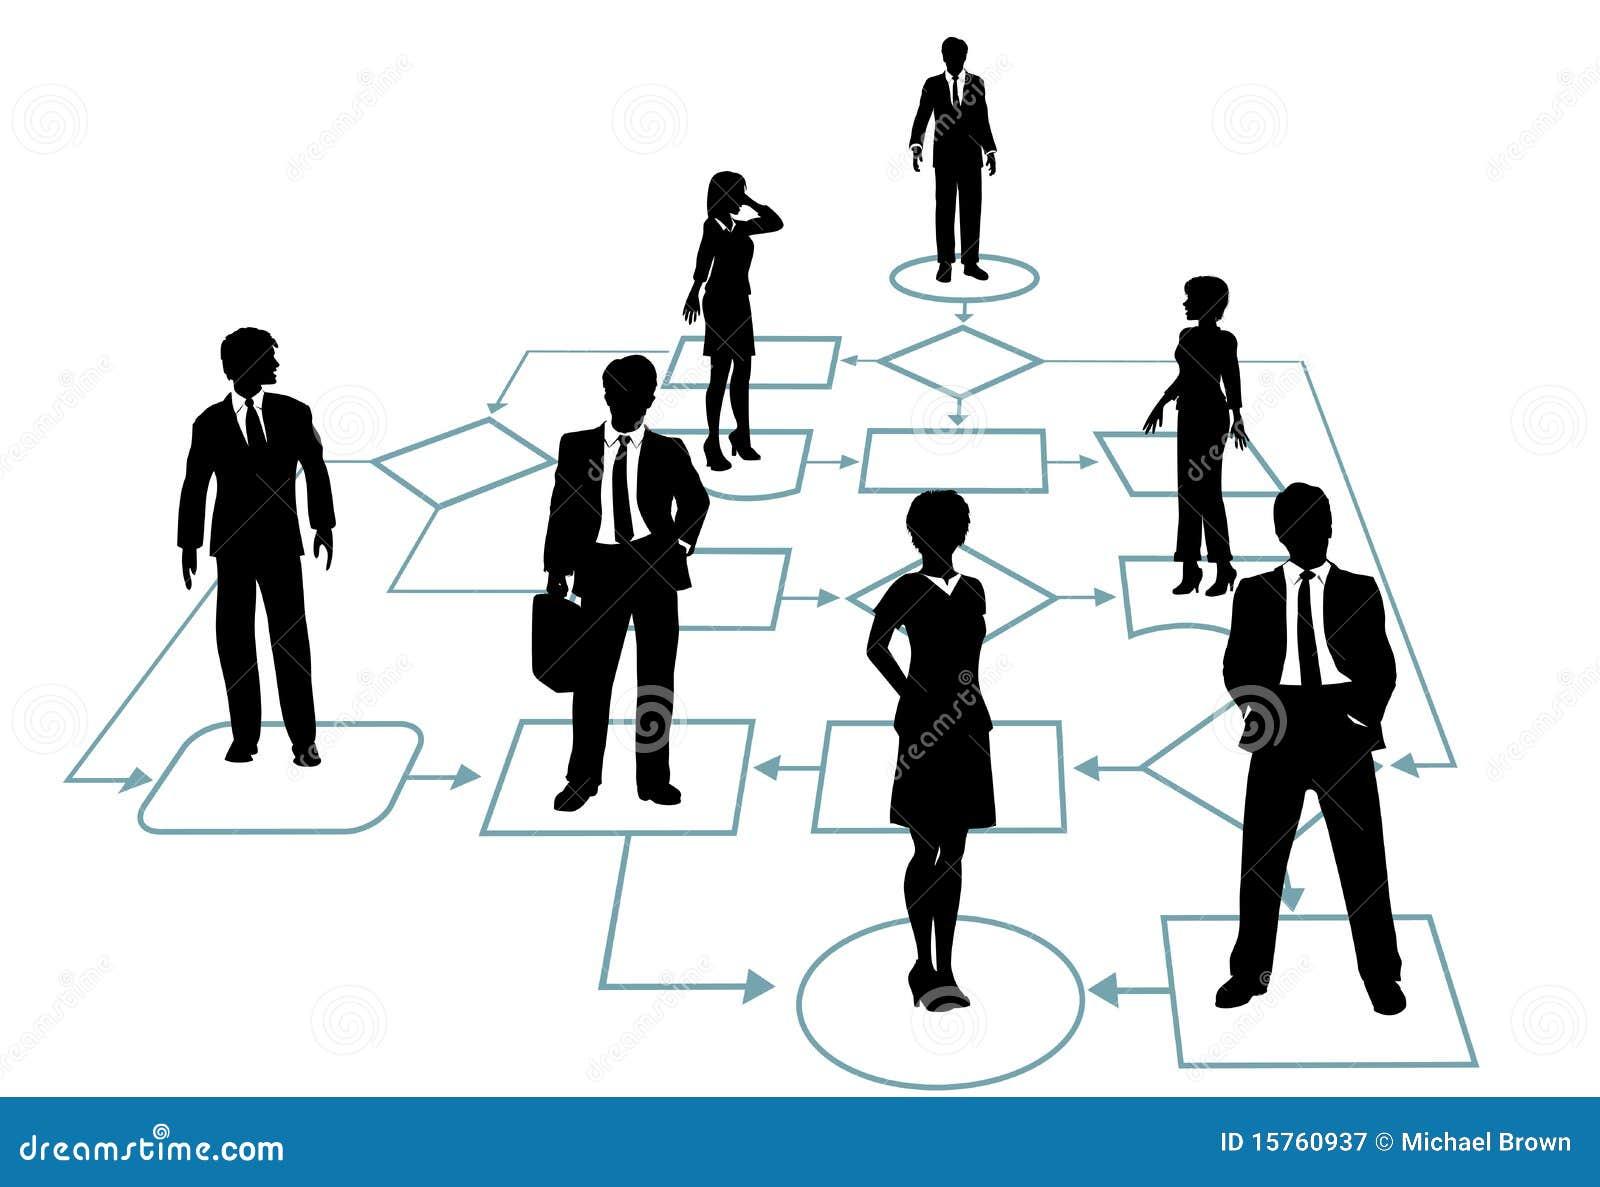 Business team in process management flowchart